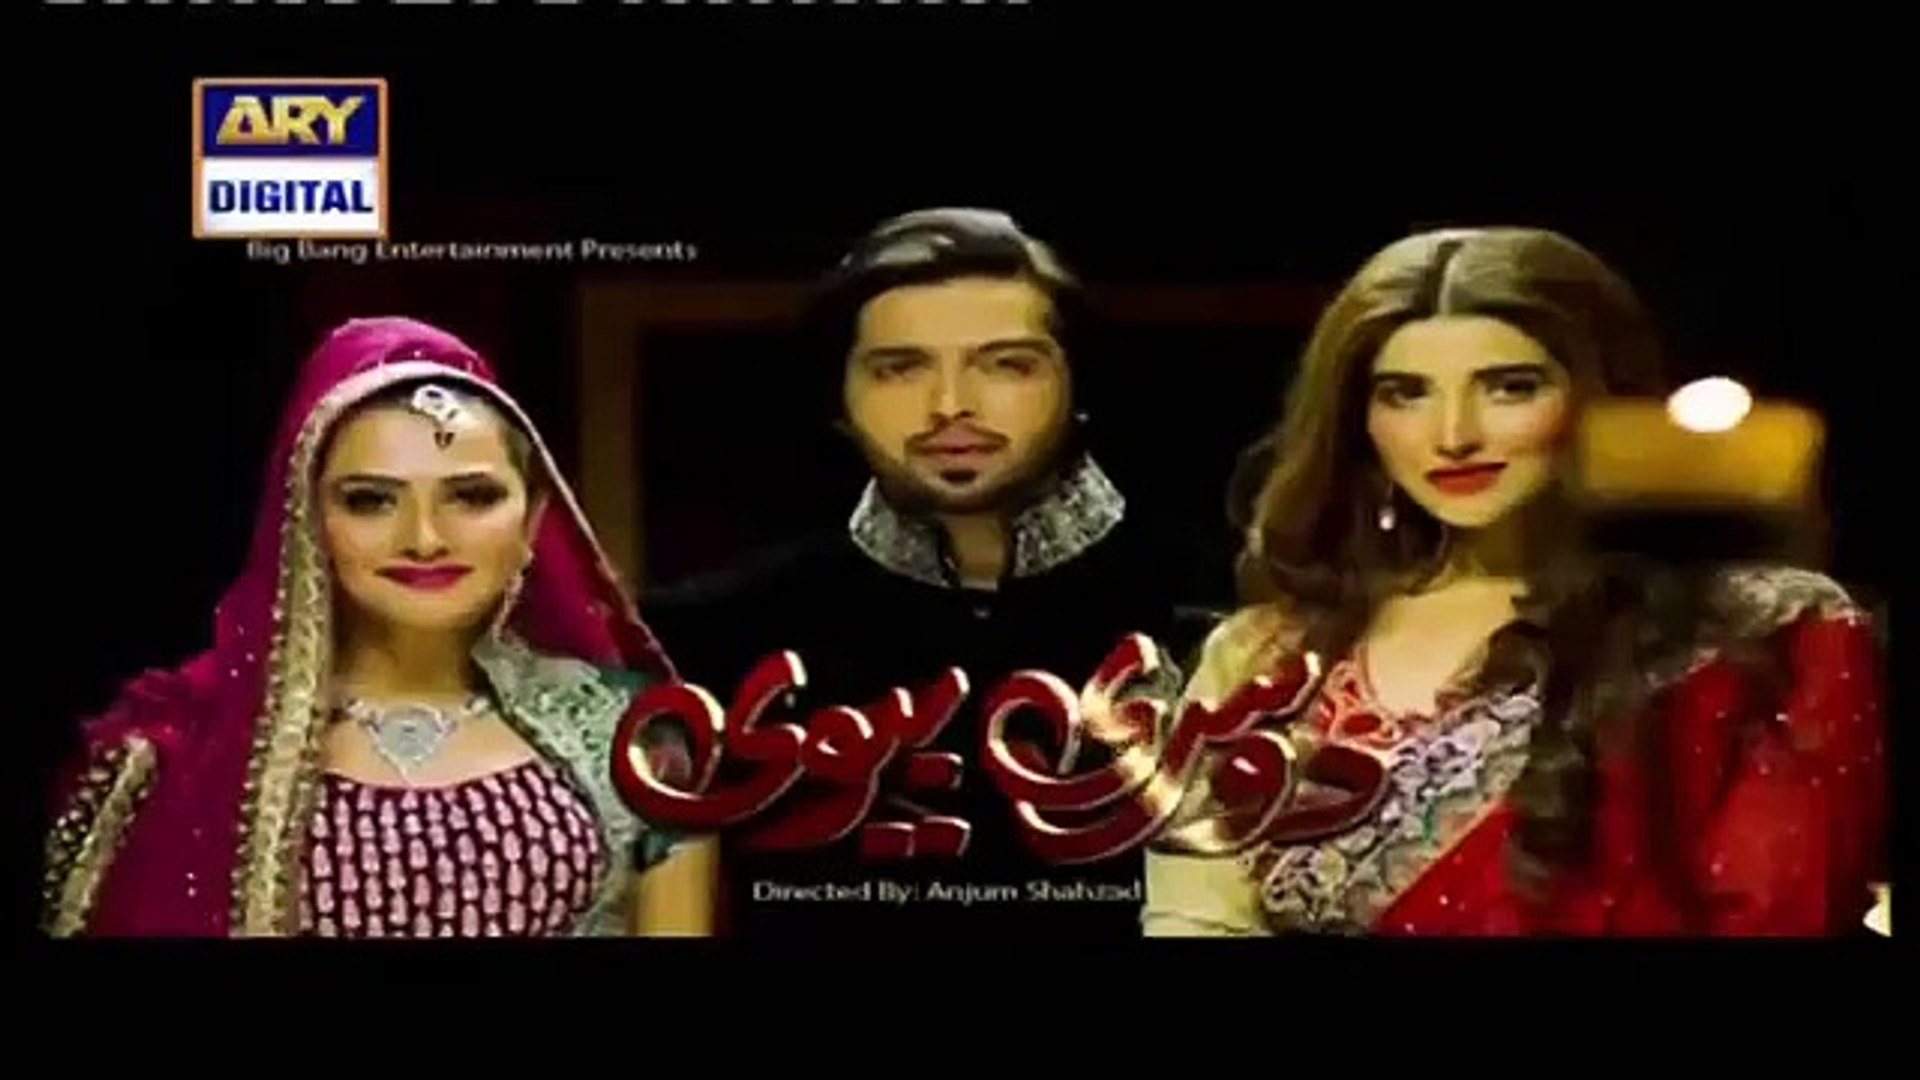 Dusri Biwi Episode 3 Full On Ary Digital 15 December 2014